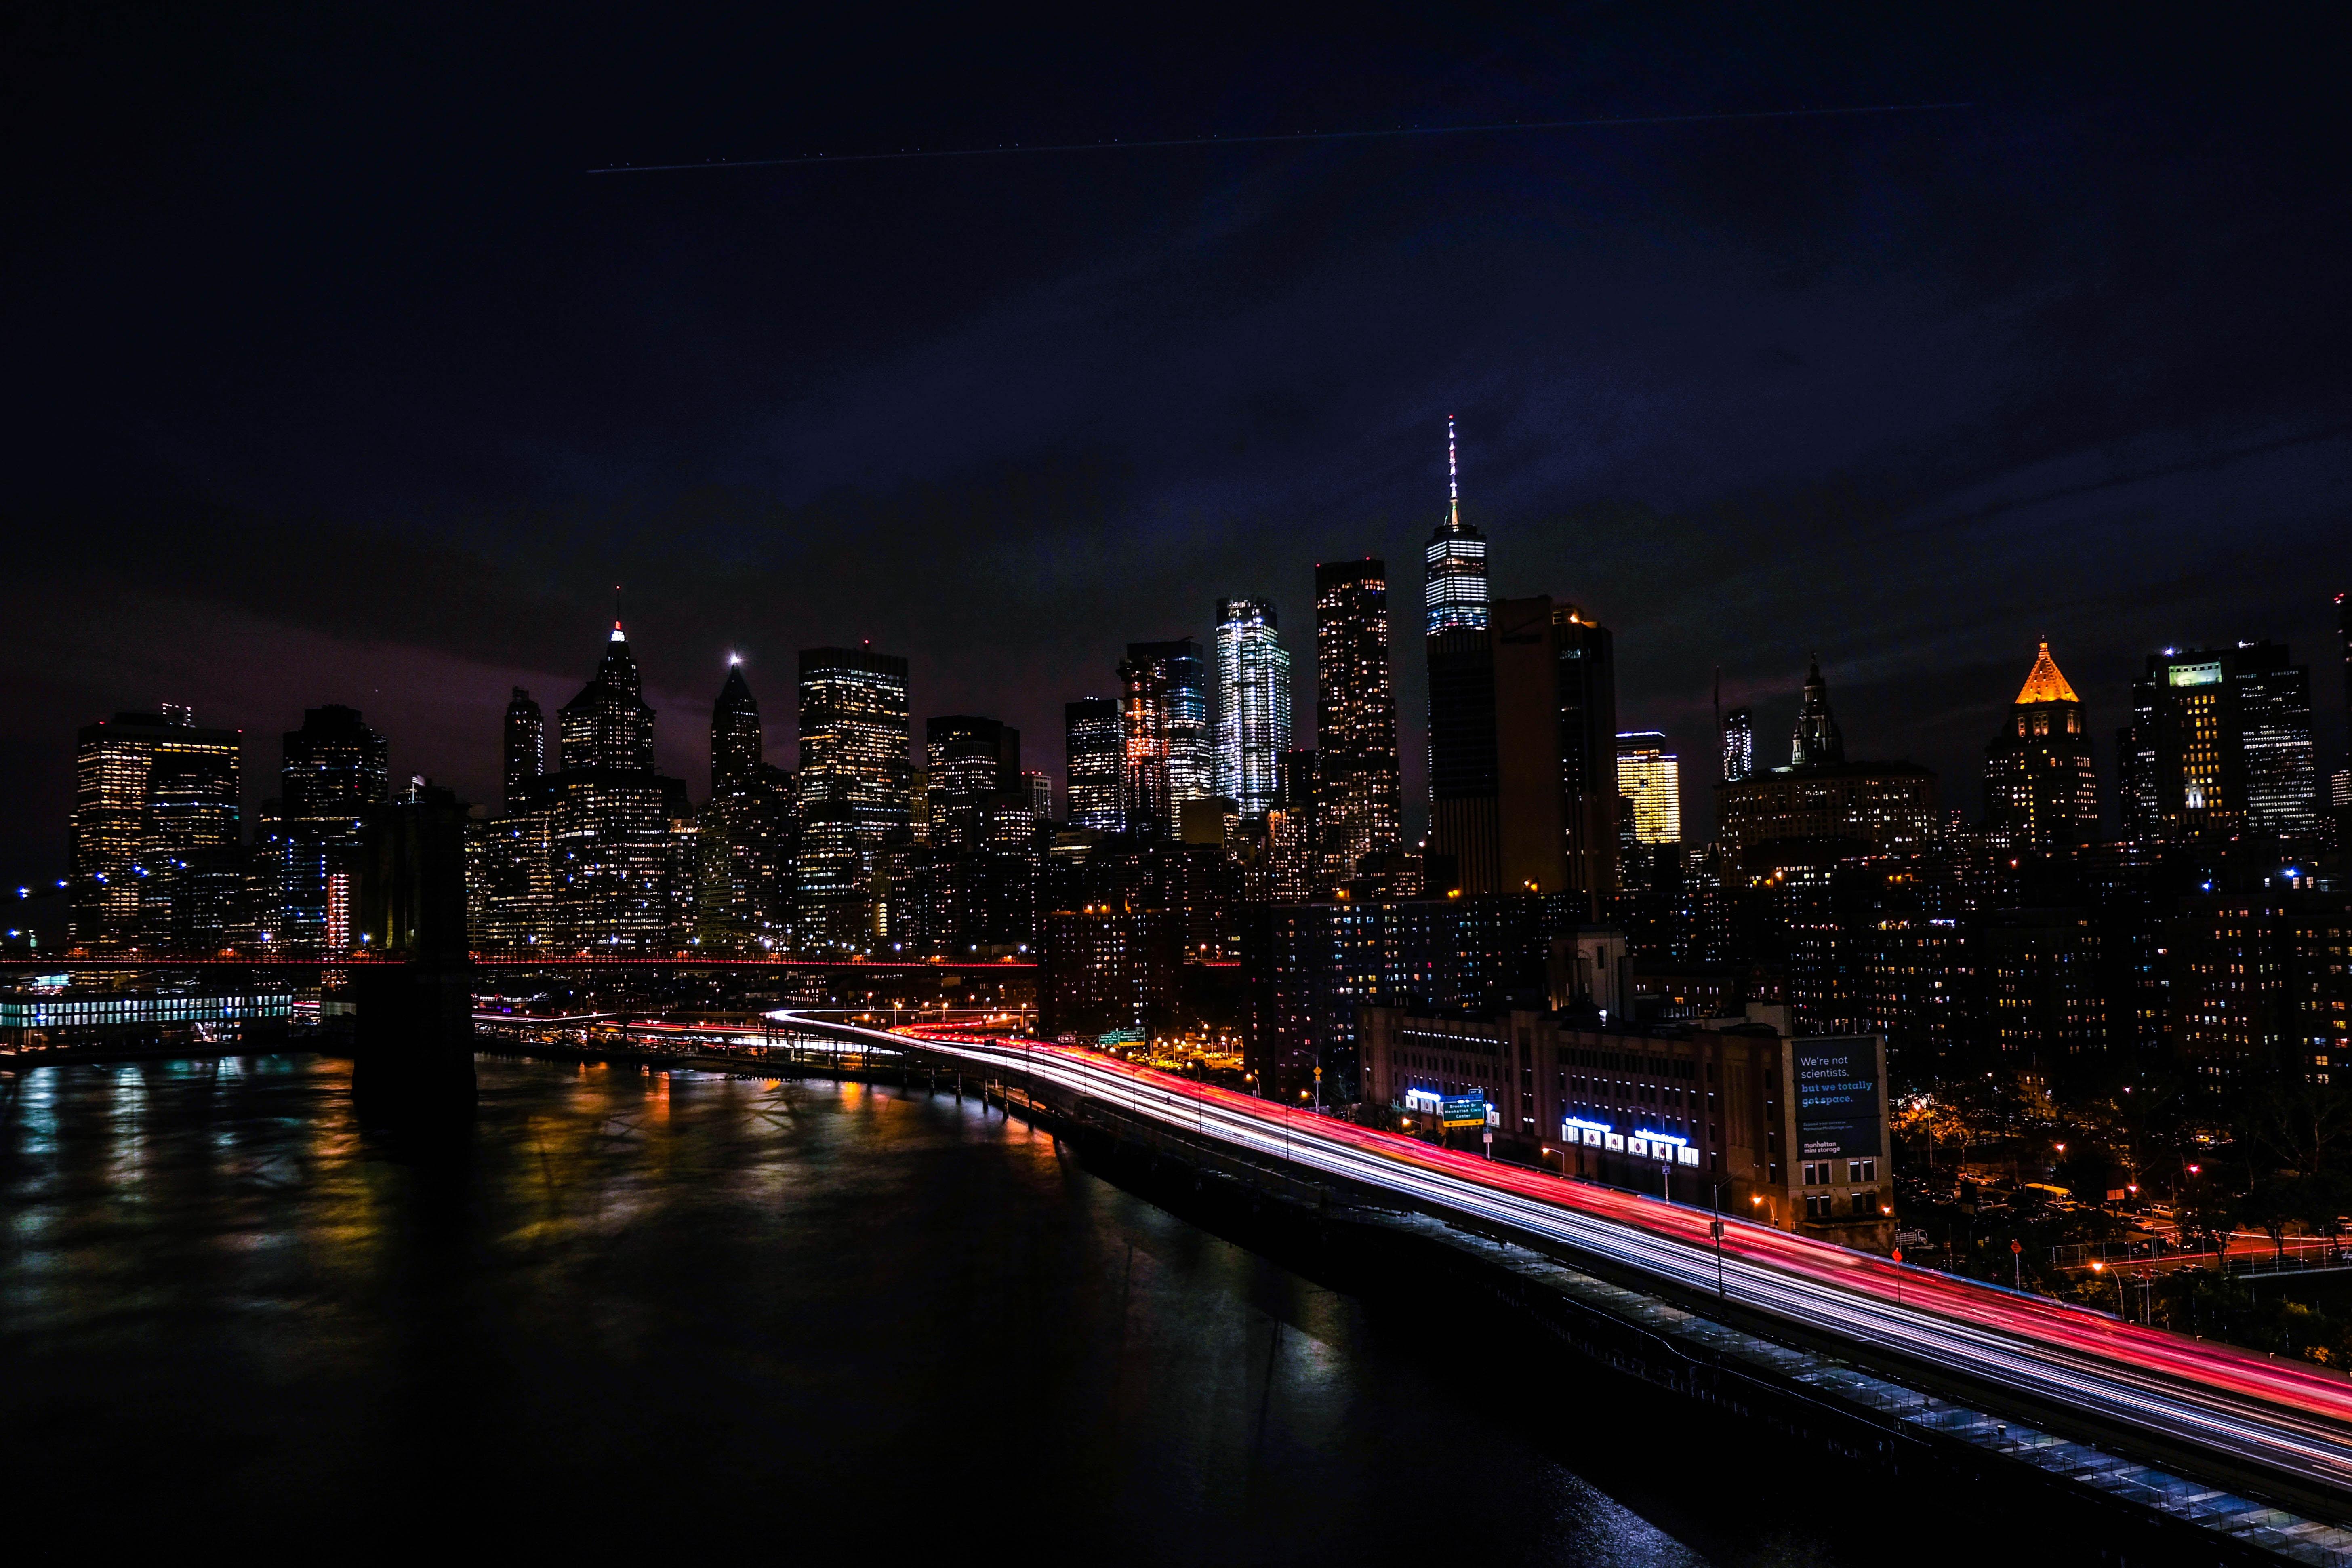 timelapse of city